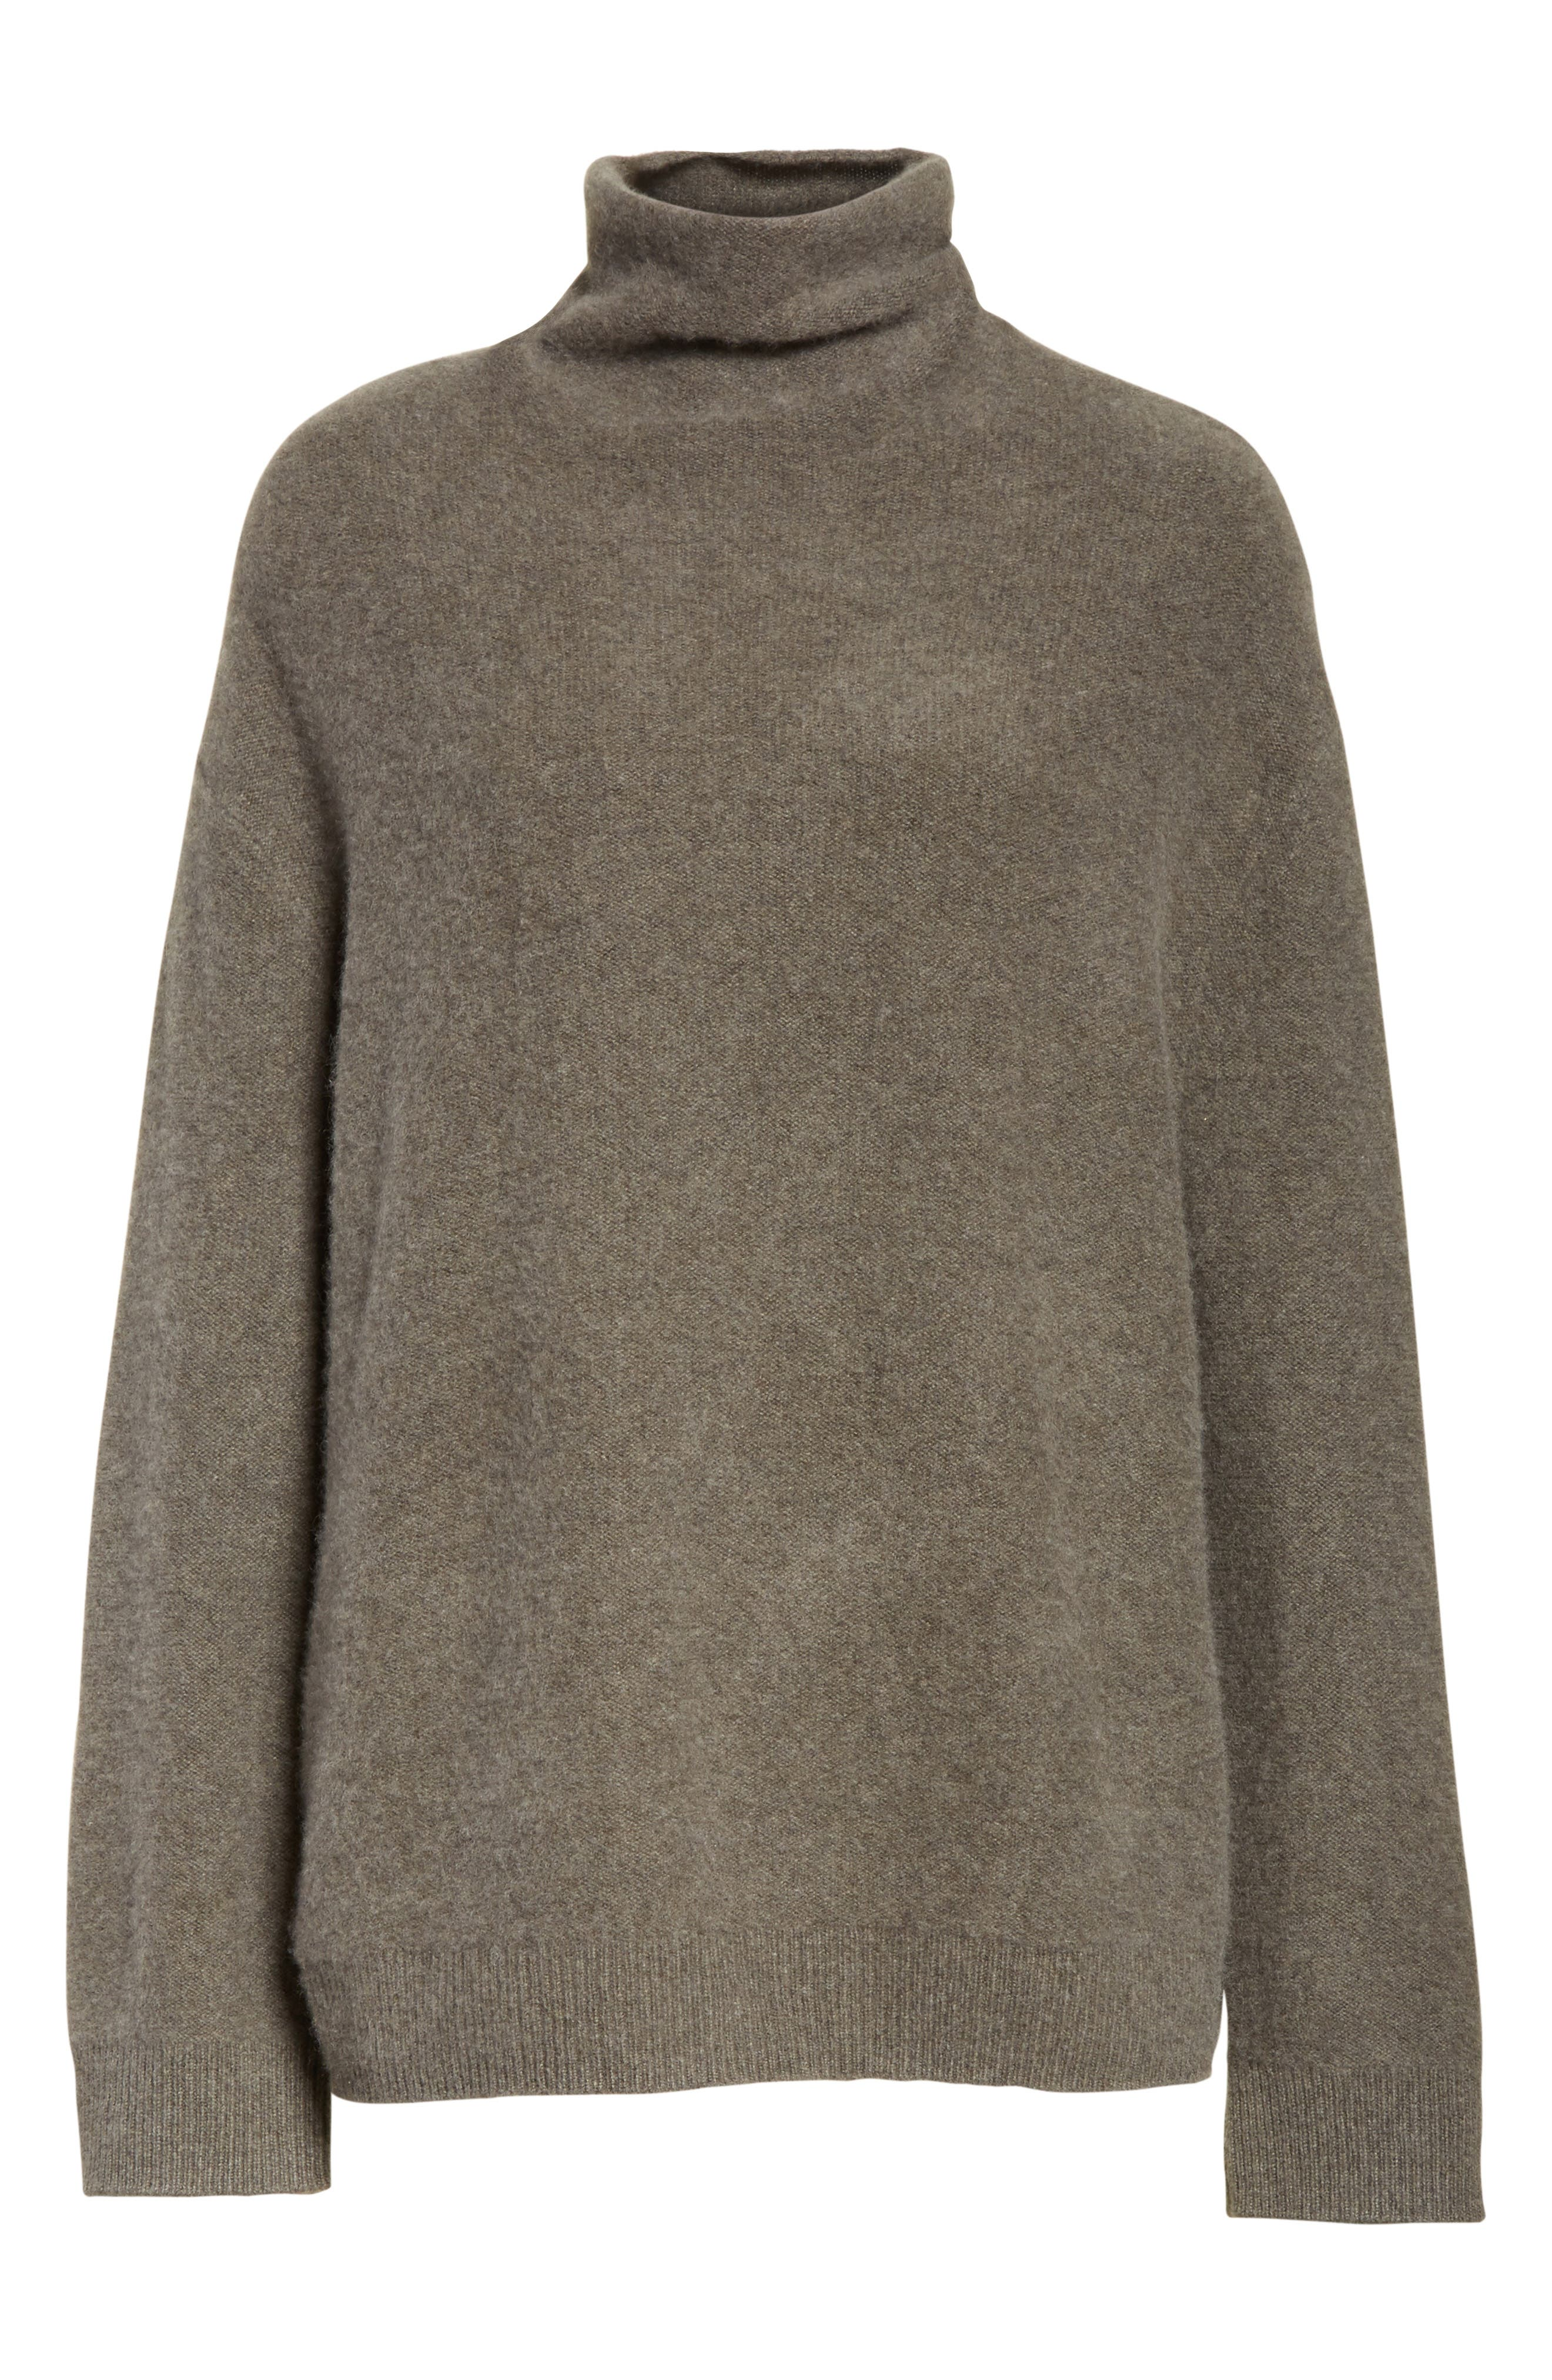 Boxy Mock Neck Cashmere Sweater,                             Alternate thumbnail 6, color,                             Desert Sage